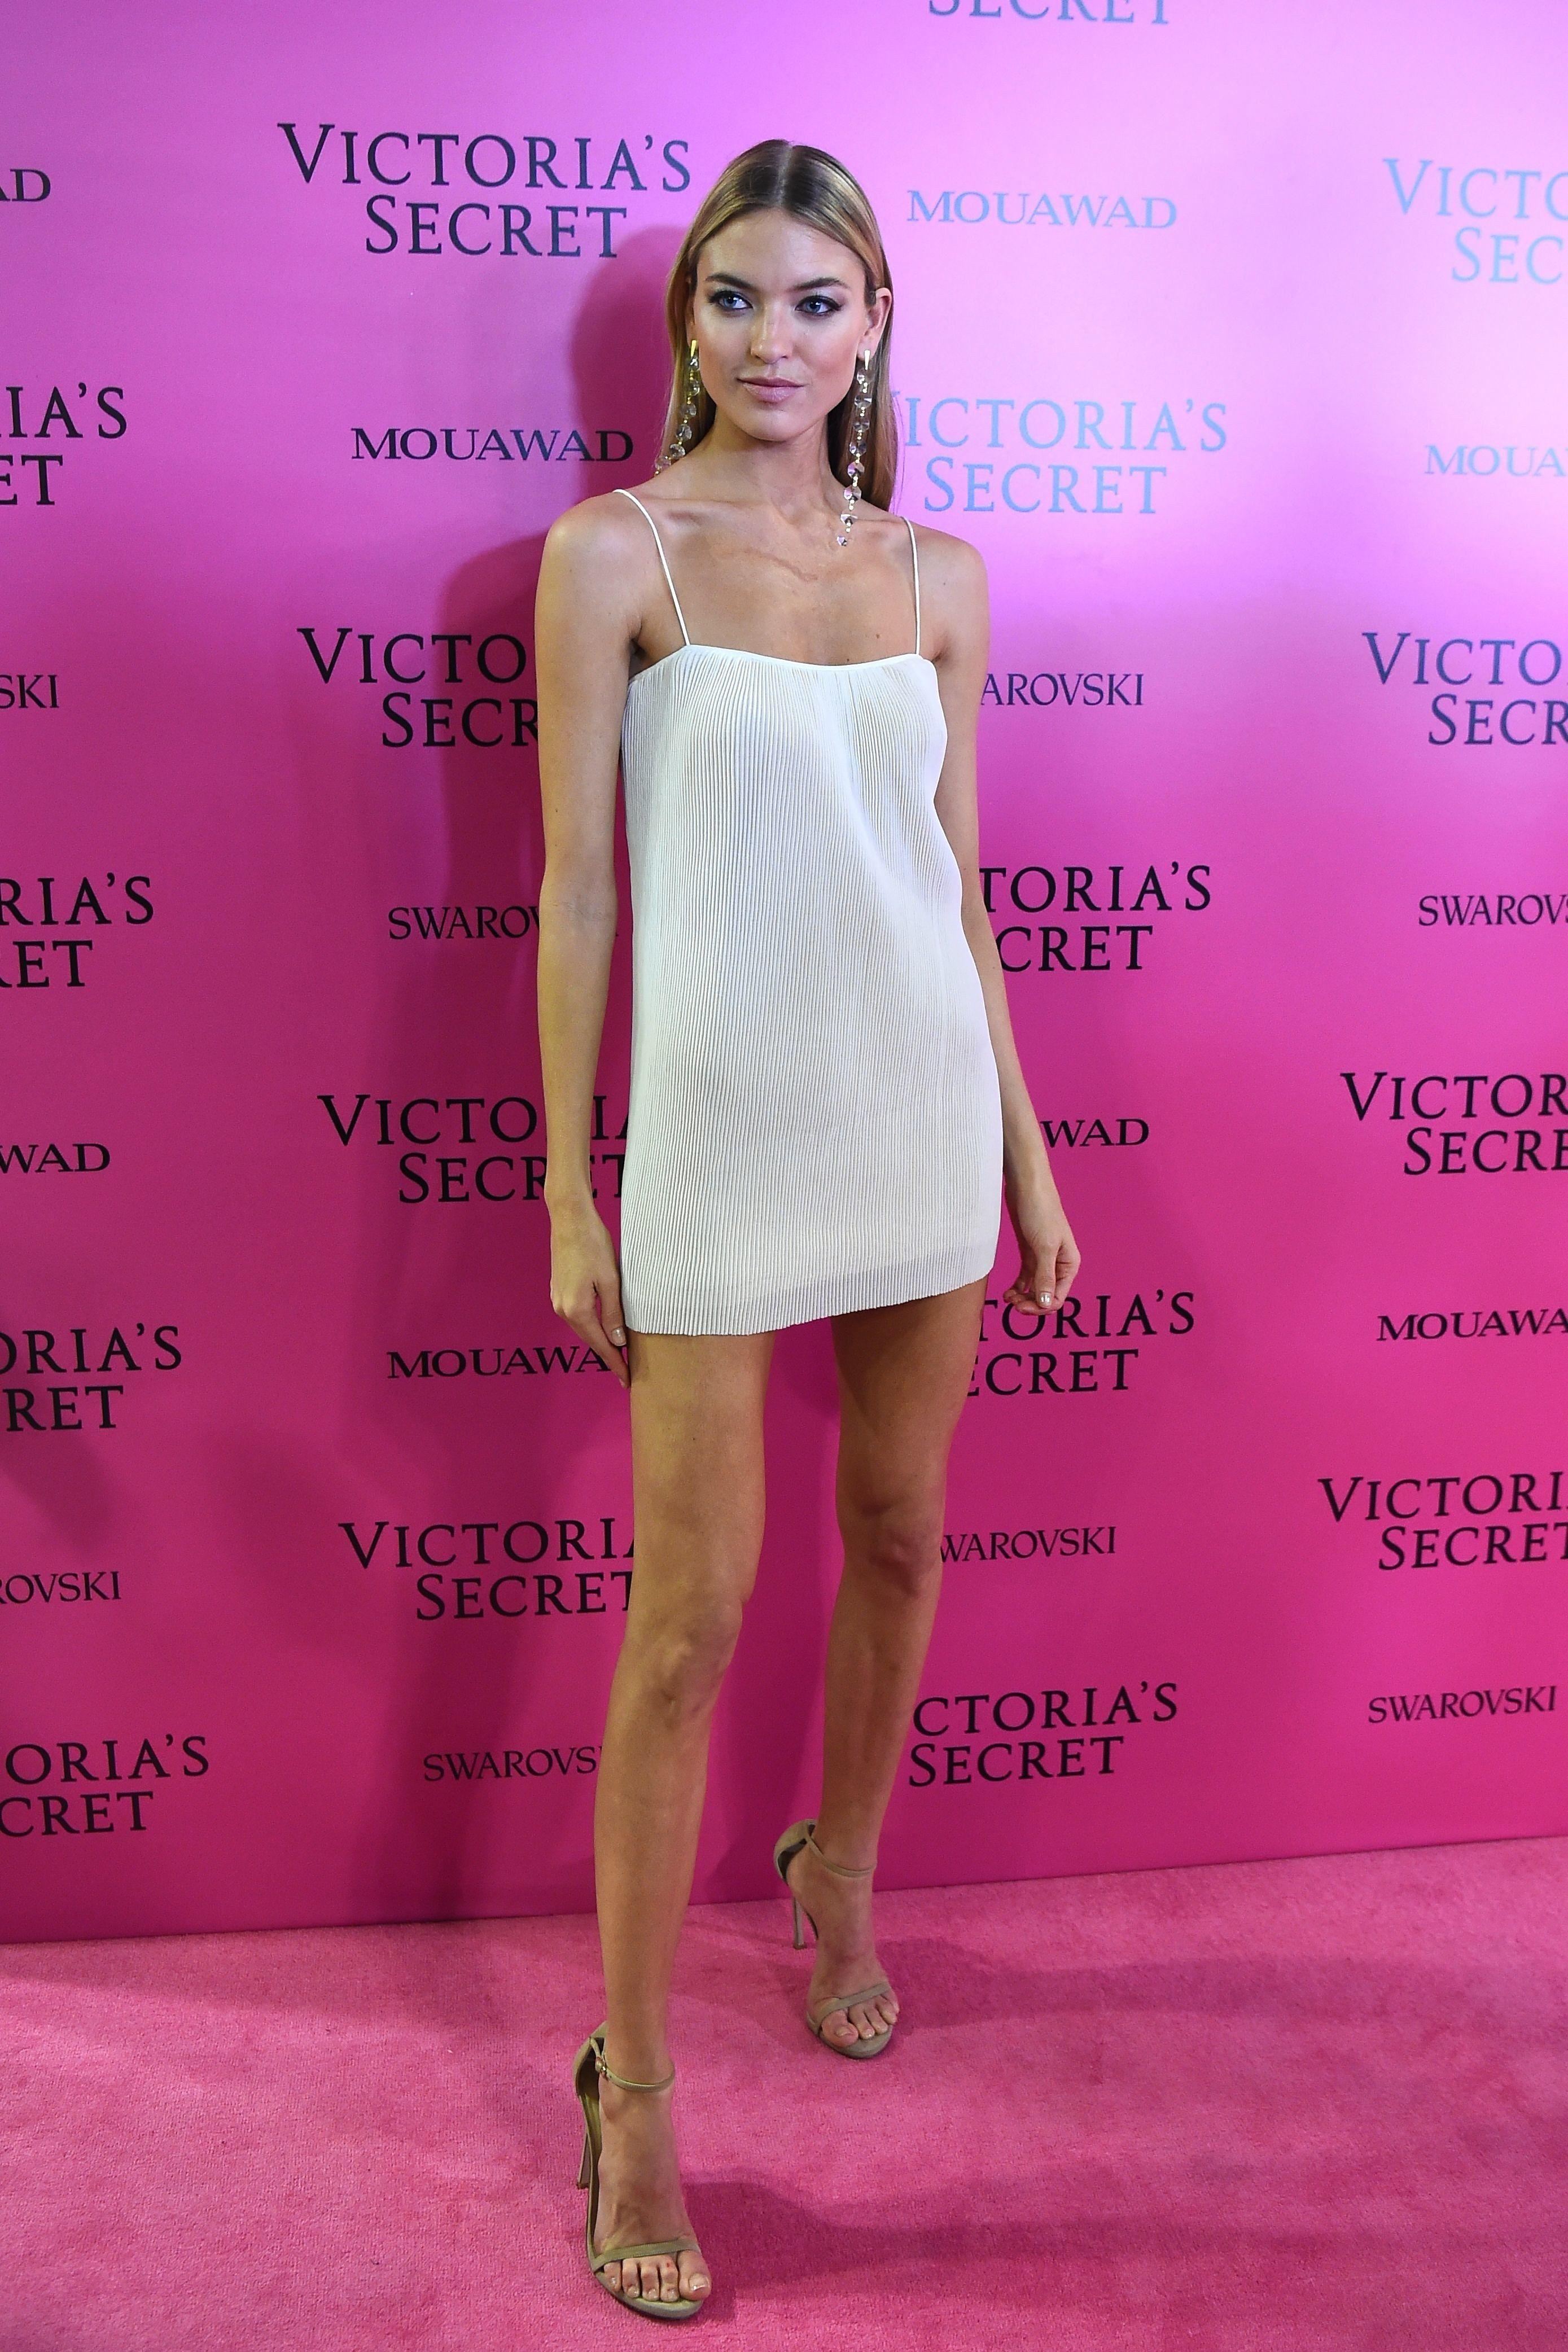 Encantador Vestidos De Fiesta Teen Vogue Composición - Colección de ...